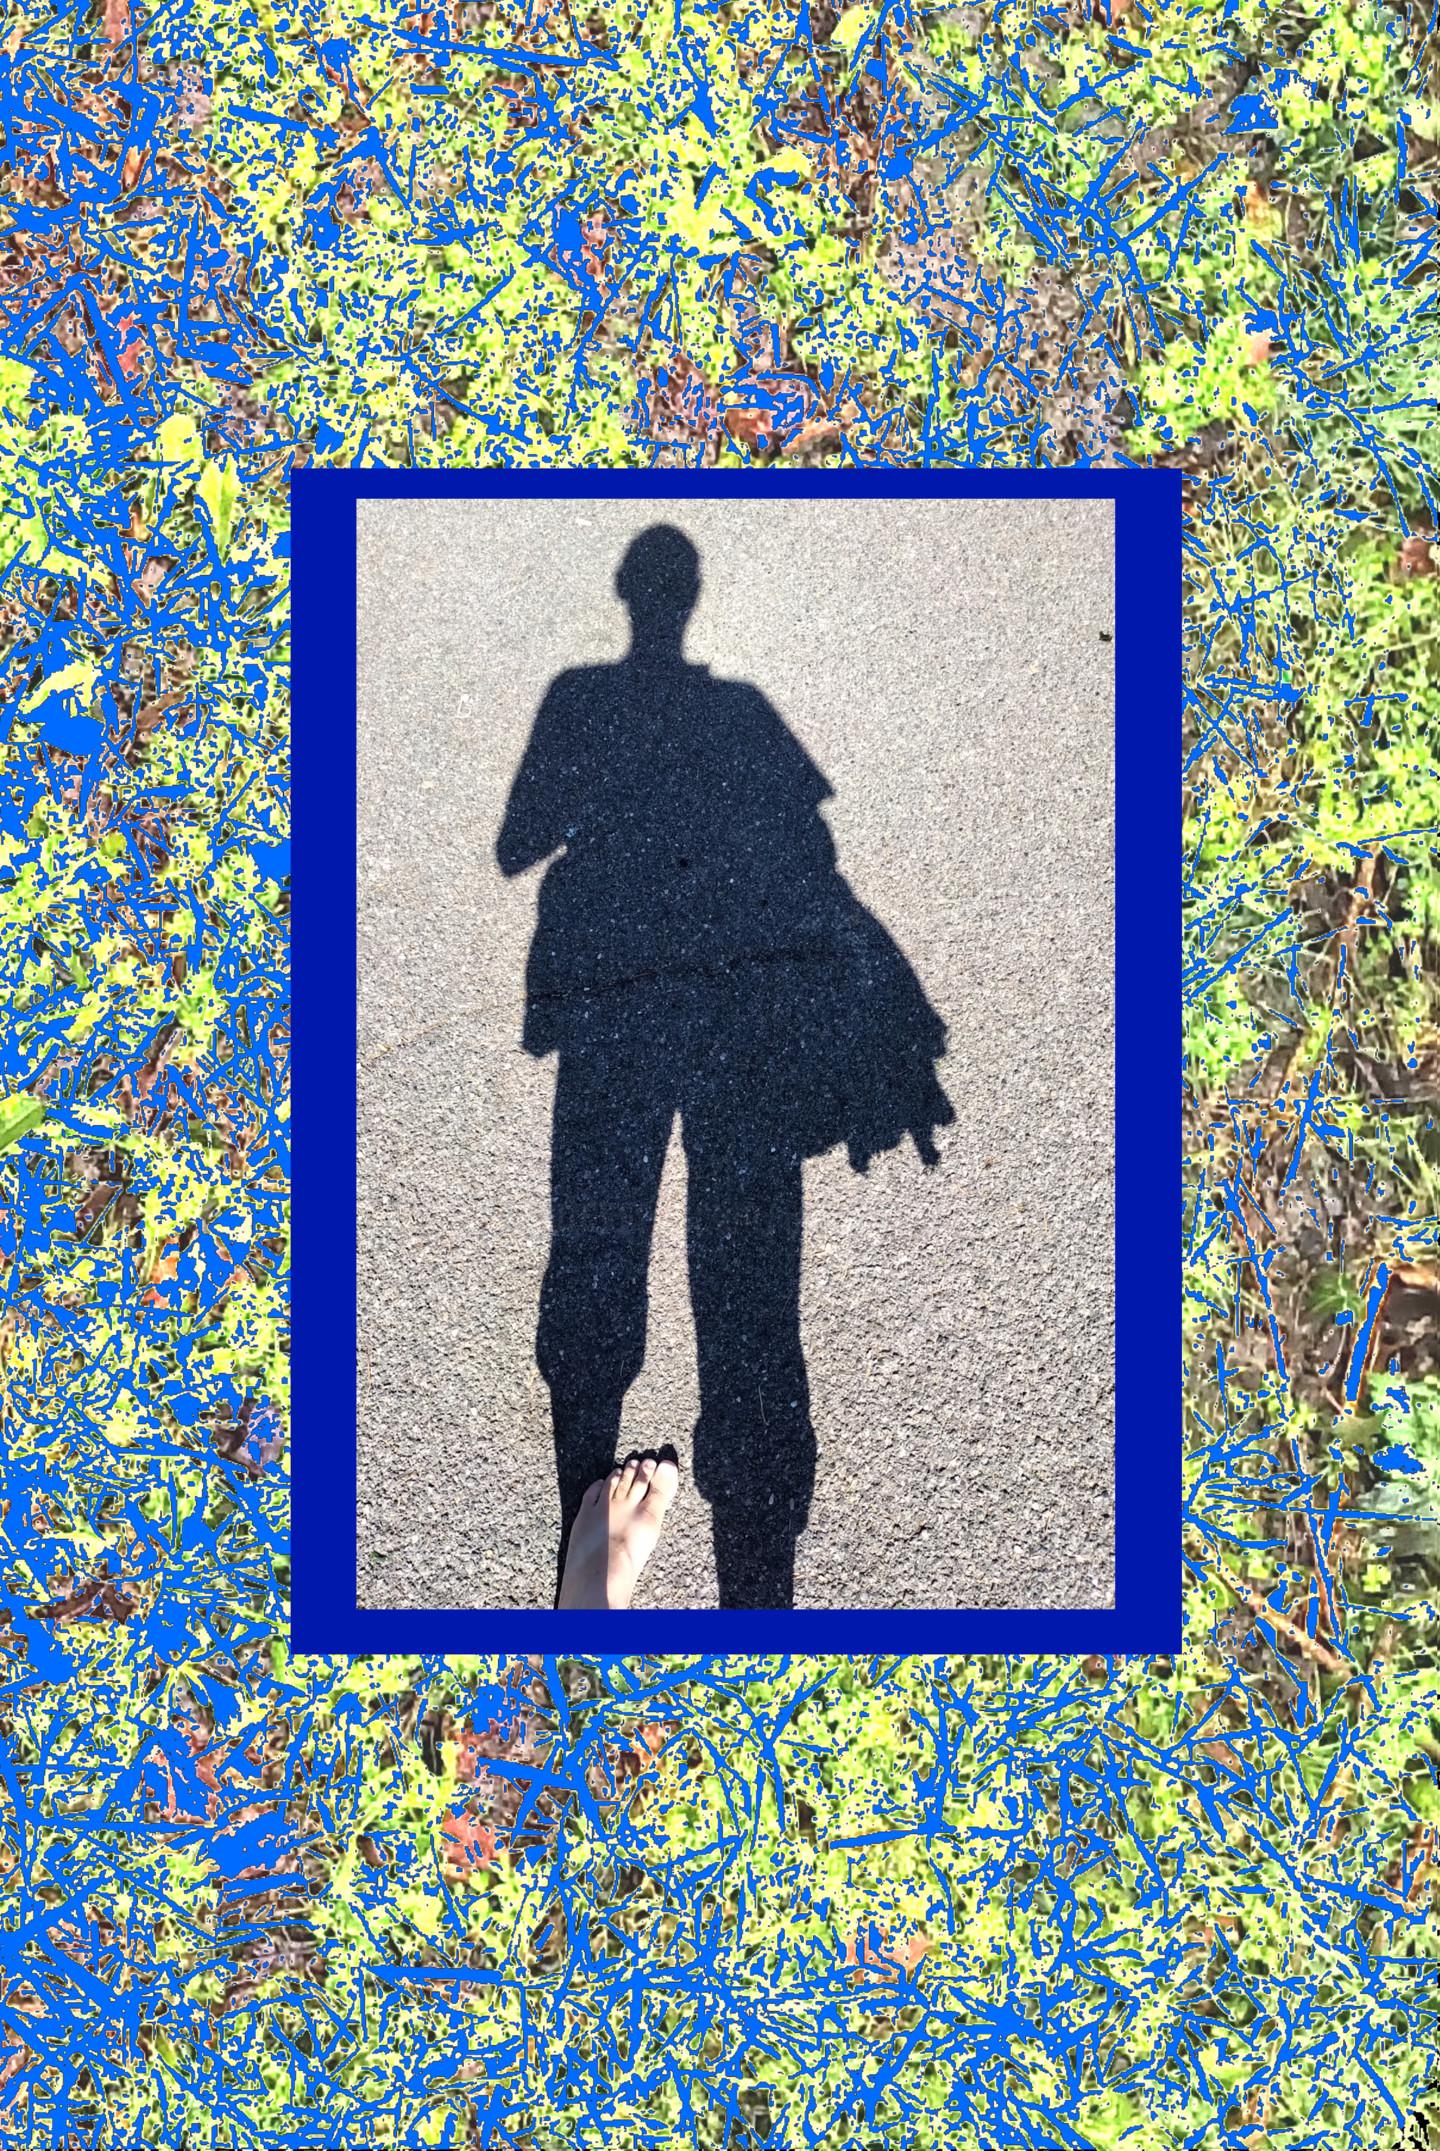 Gerald Shepherd - The Echo Of Personality